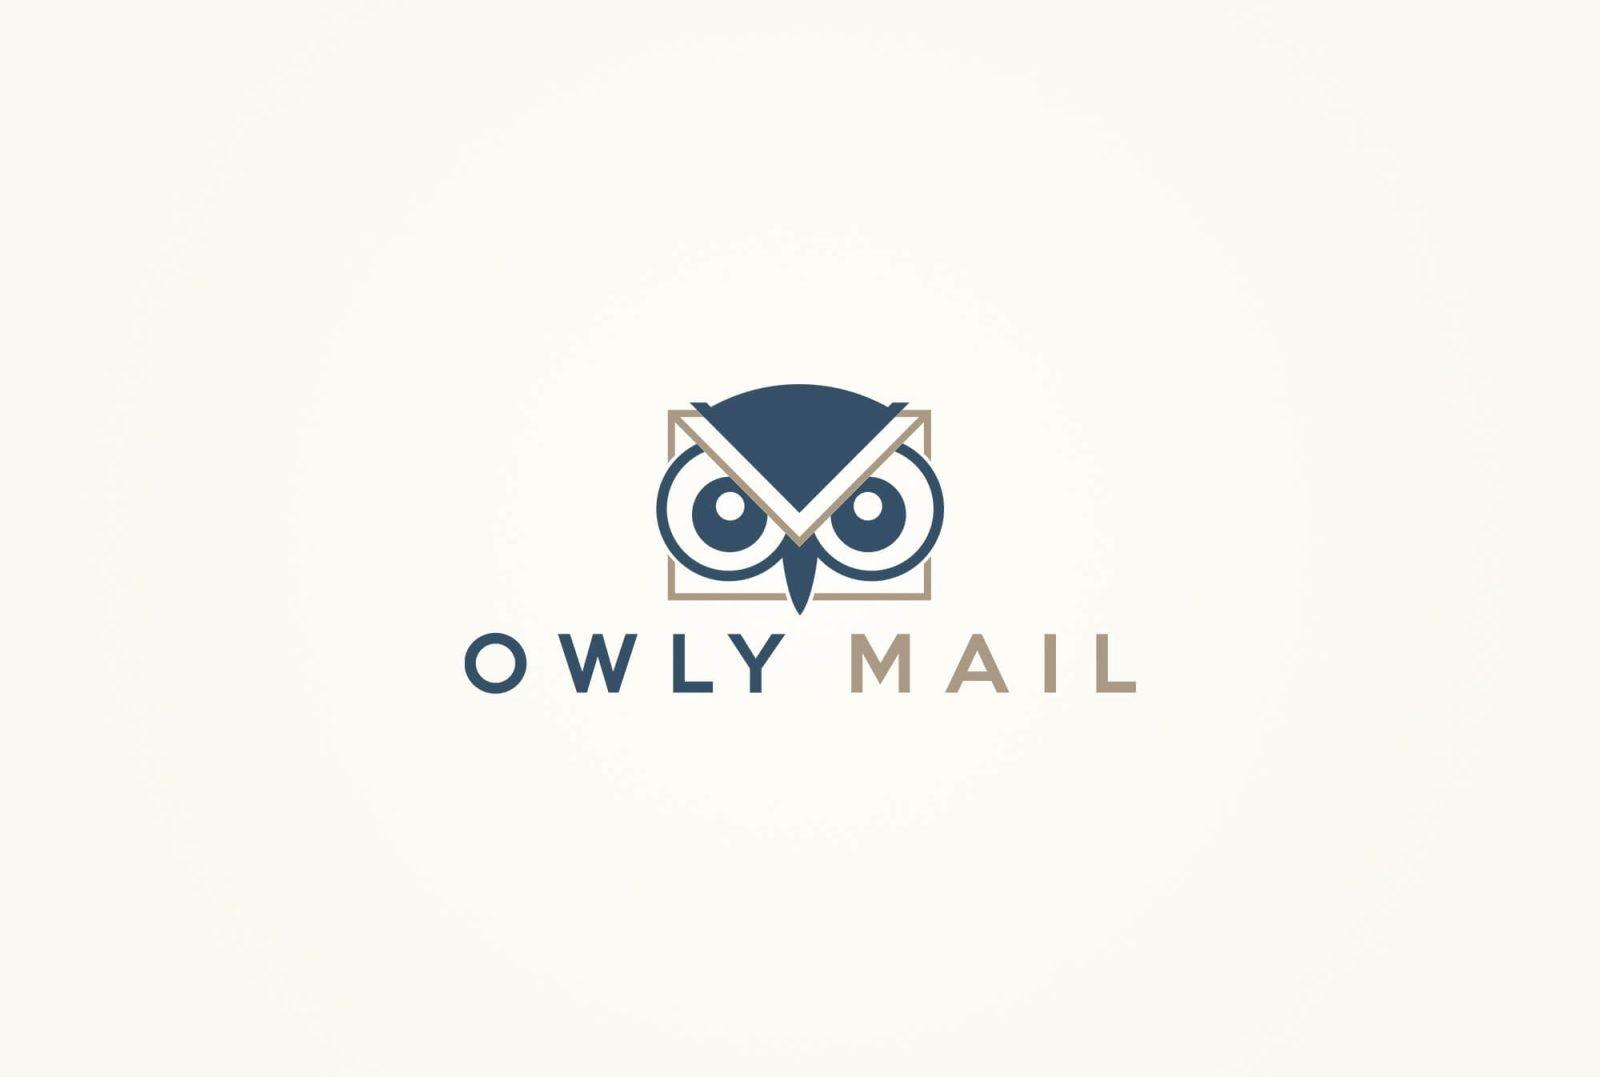 OWLY MAIL